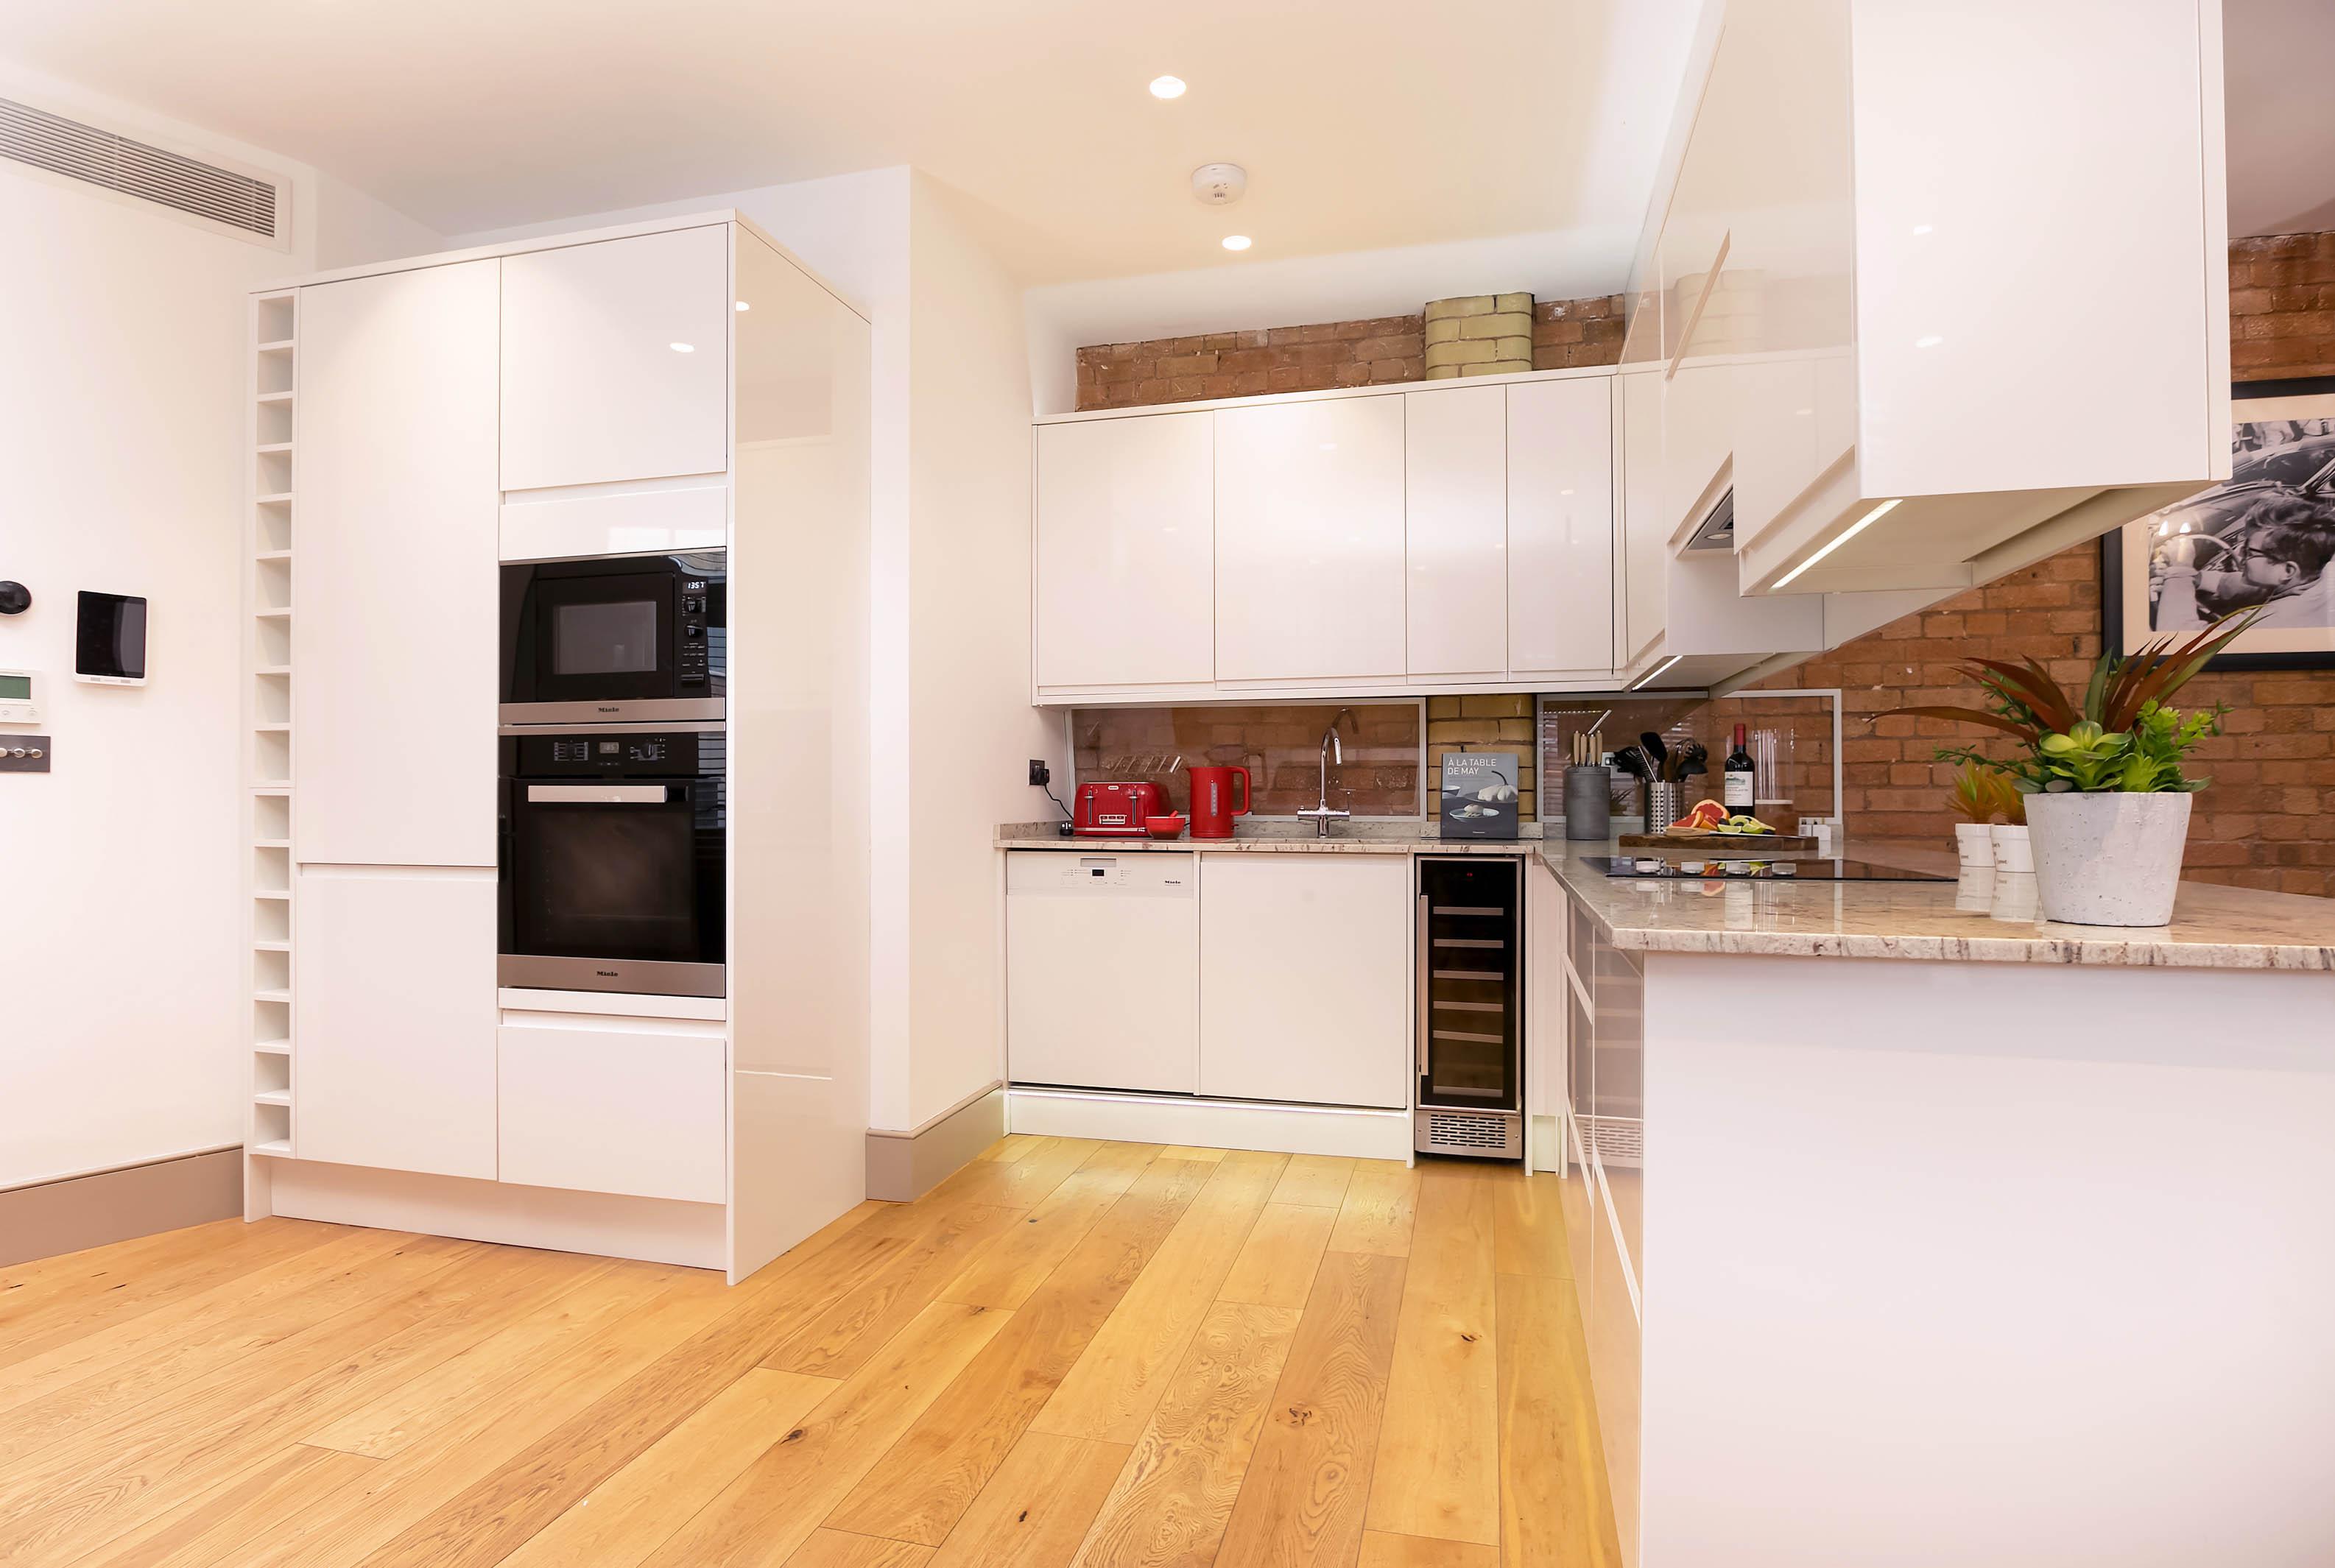 Lovelydays luxury service apartment rental - London - Fitzrovia - Wells Mews B - Lovelysuite - 2 bedrooms - 2 bathrooms - Luxury kitchen - 01acce06ed98 - Lovelydays